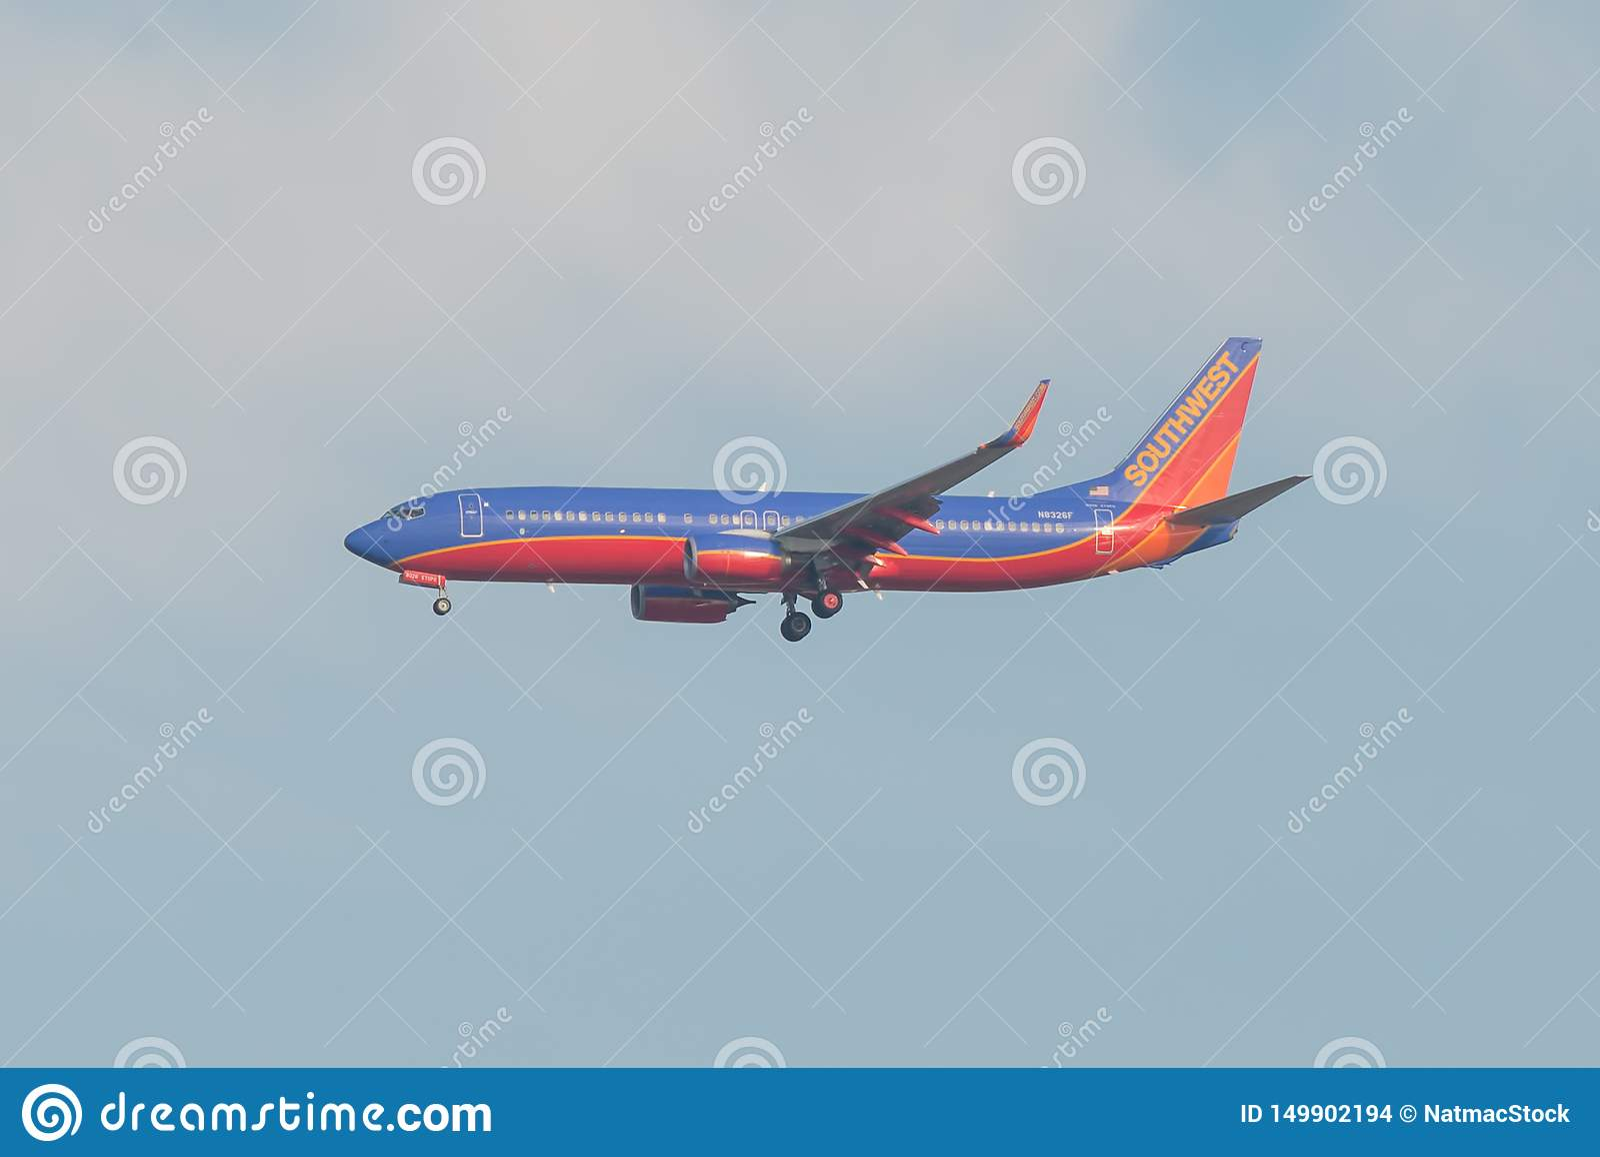 BLOOMINGTON, MINNESOTA/USA - 1. NOVEMBER 2013 - Southwest Airlines-Fläche nahe MSP - Minneapolis/St. Paul Airport mit Rotem, blau